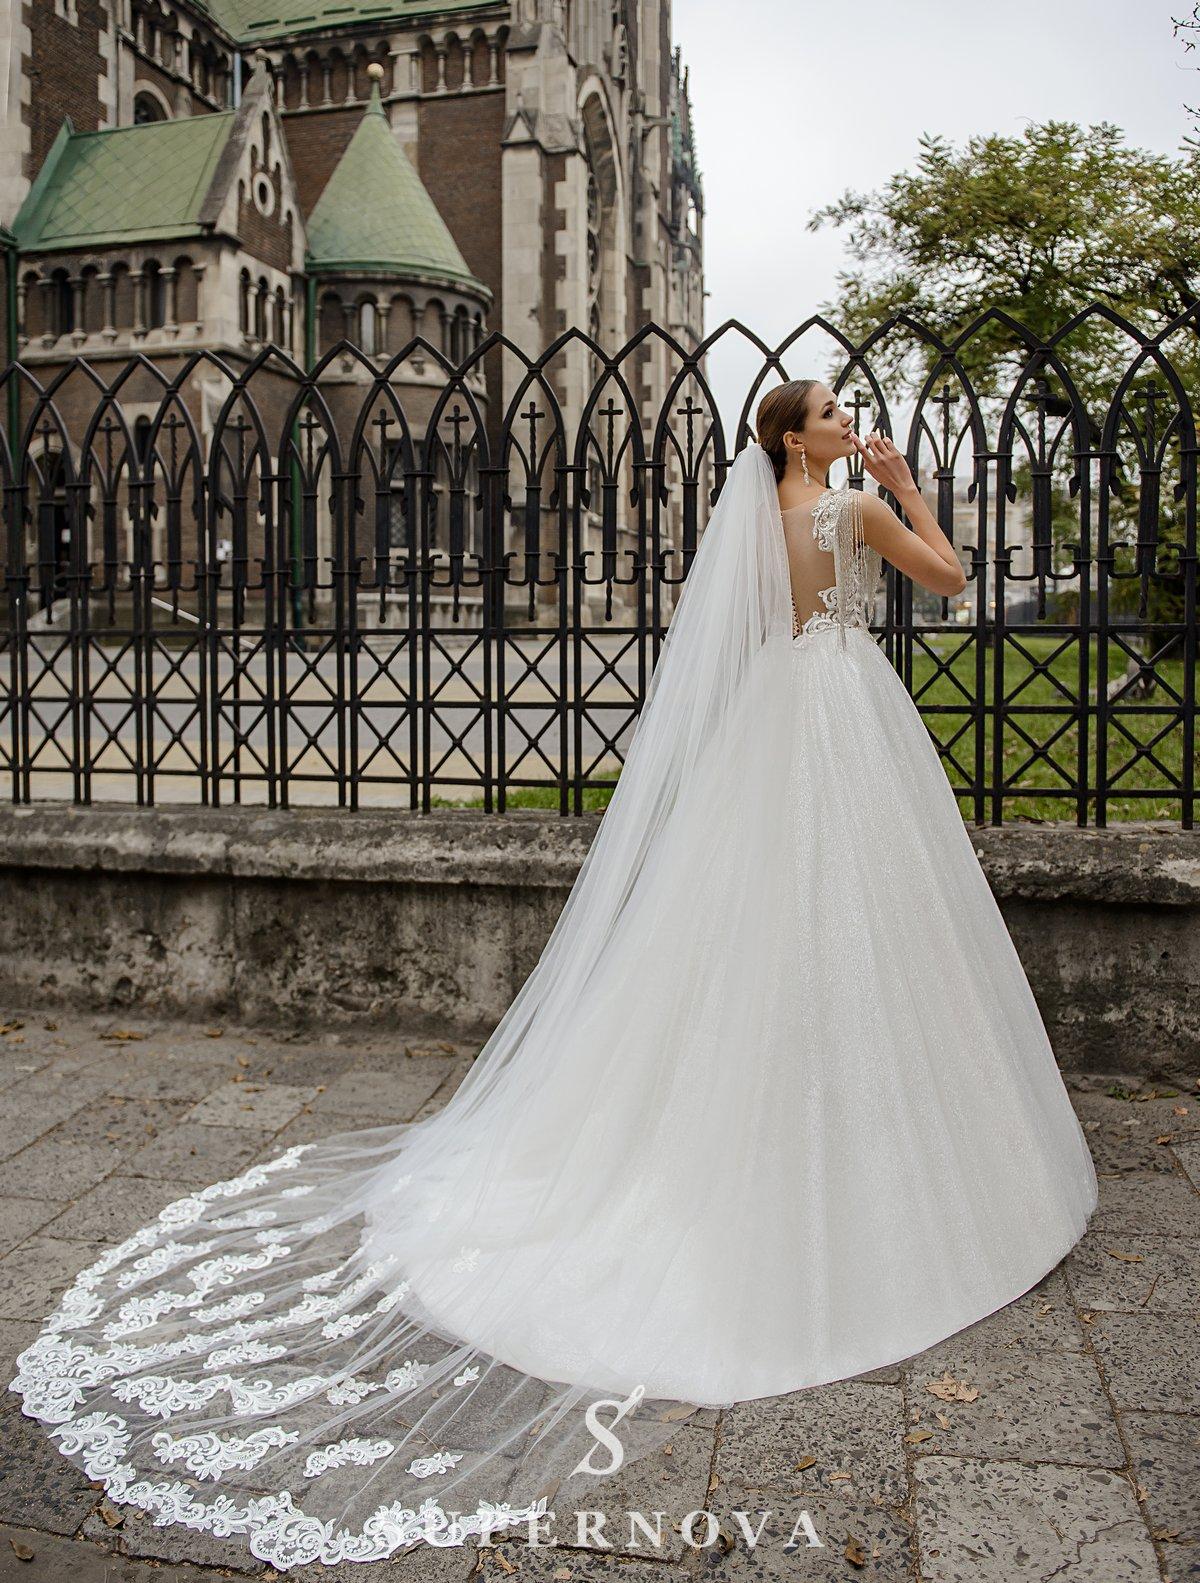 Long wedding veil on wholesale from the manufacturer Super Nova-1